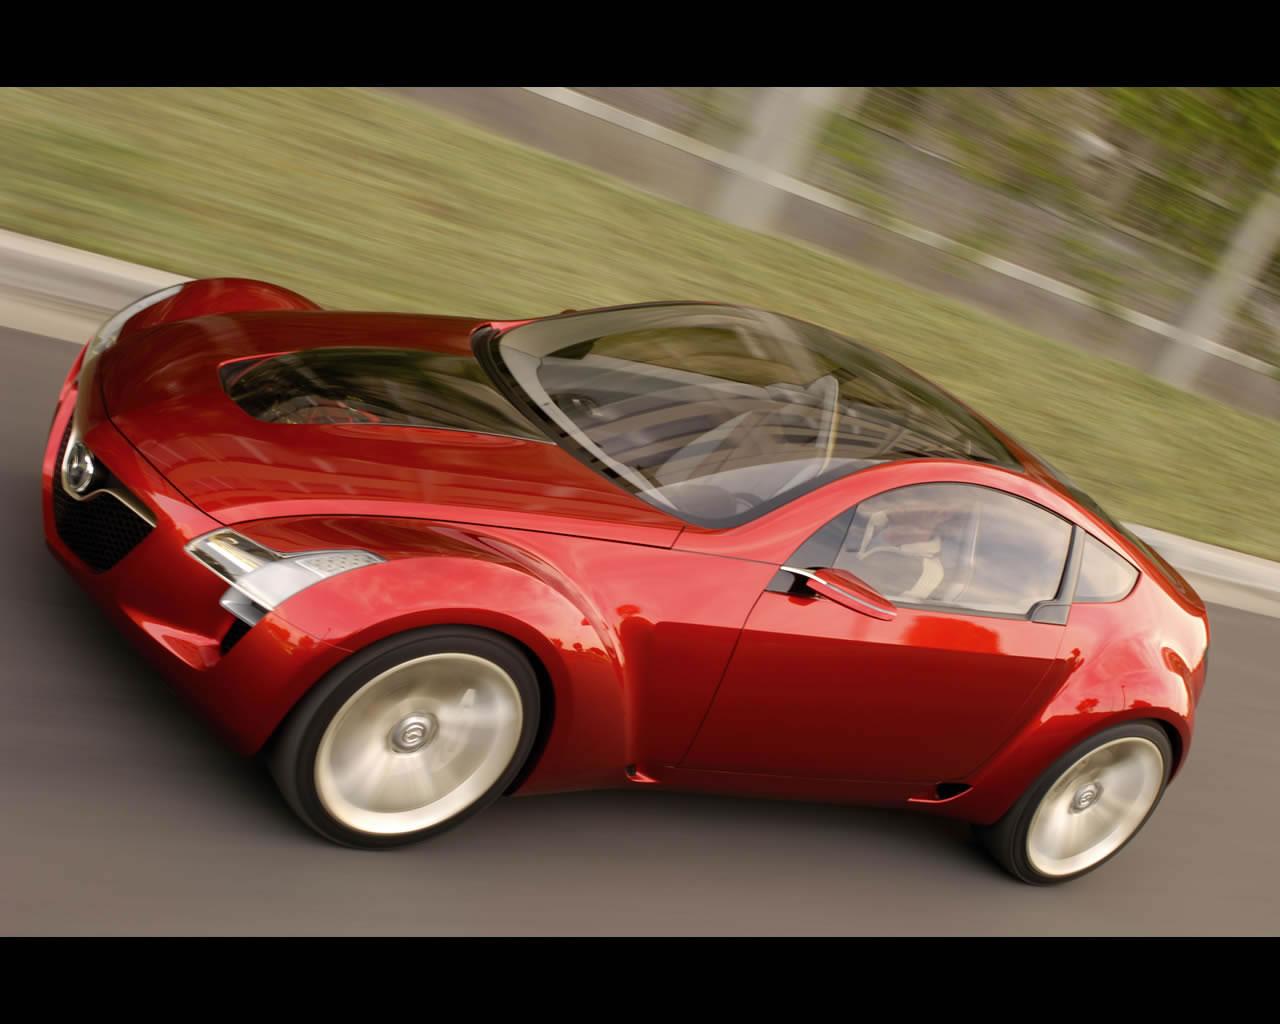 http://www.autoconcept-reviews.com/cars_reviews/mazda/mazda-kabura/wallpaper/Mazda_Kabura_2006_01_print.jpg